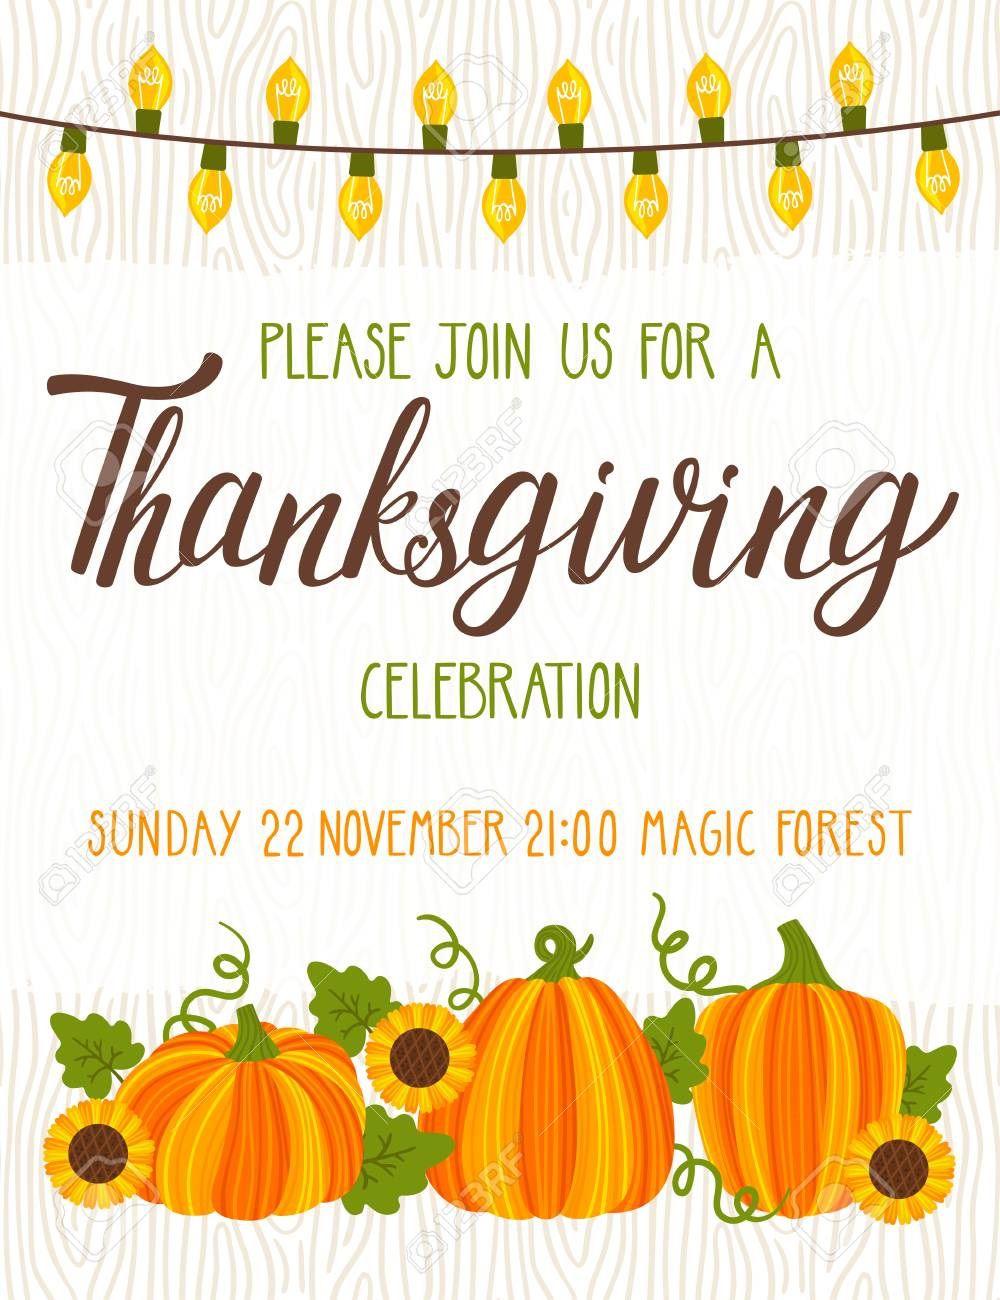 003 Astounding Free Thanksgiving Invitation Template Design  Templates Printable Dinner Download PotluckFull